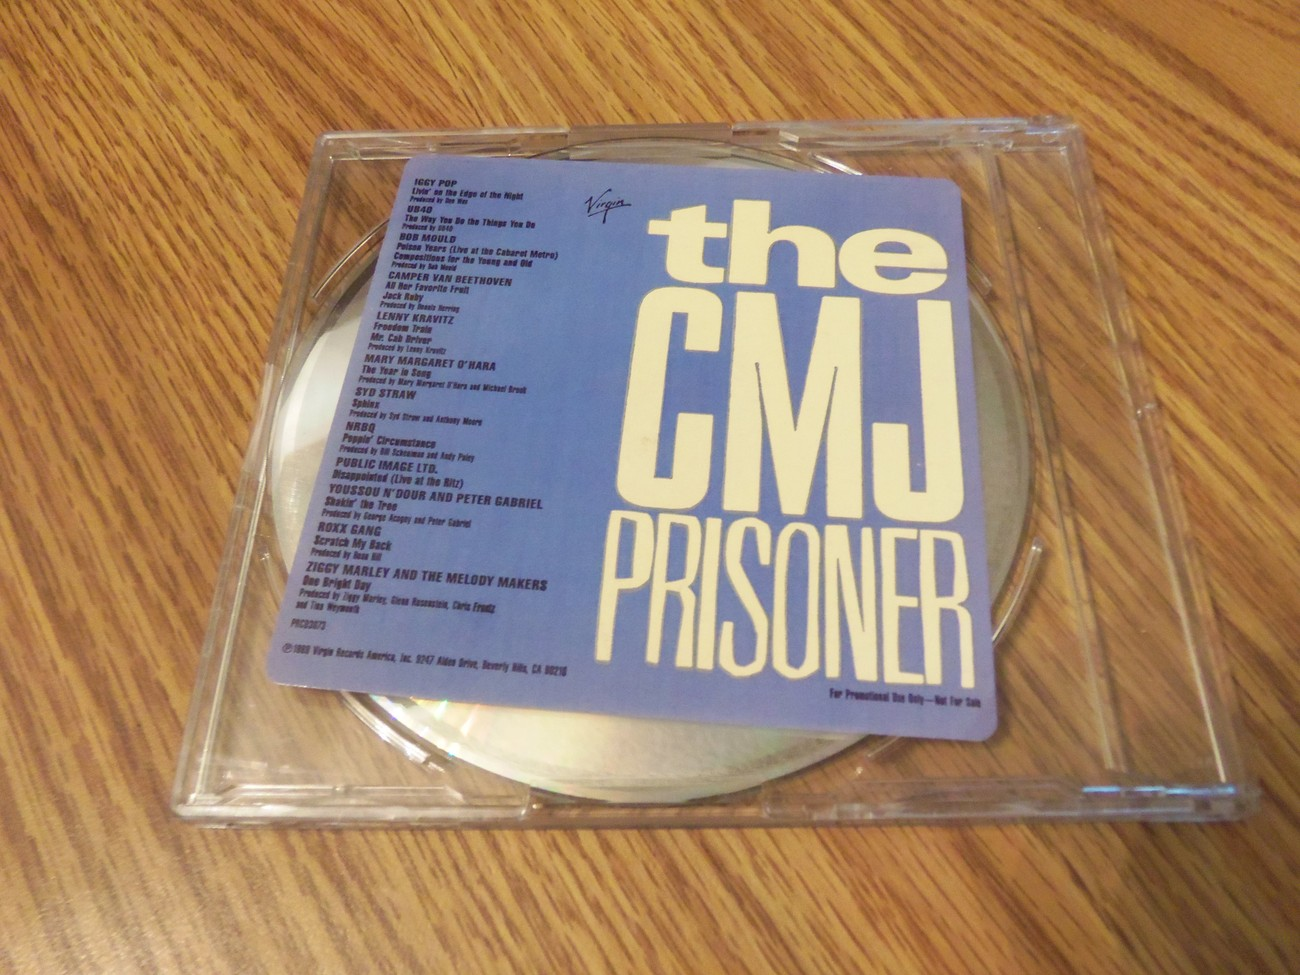 The CMJ Prisoner 1988 Virgin Promo Cd Iggy Pop Bob Mould NRBQ Peter Gabriel